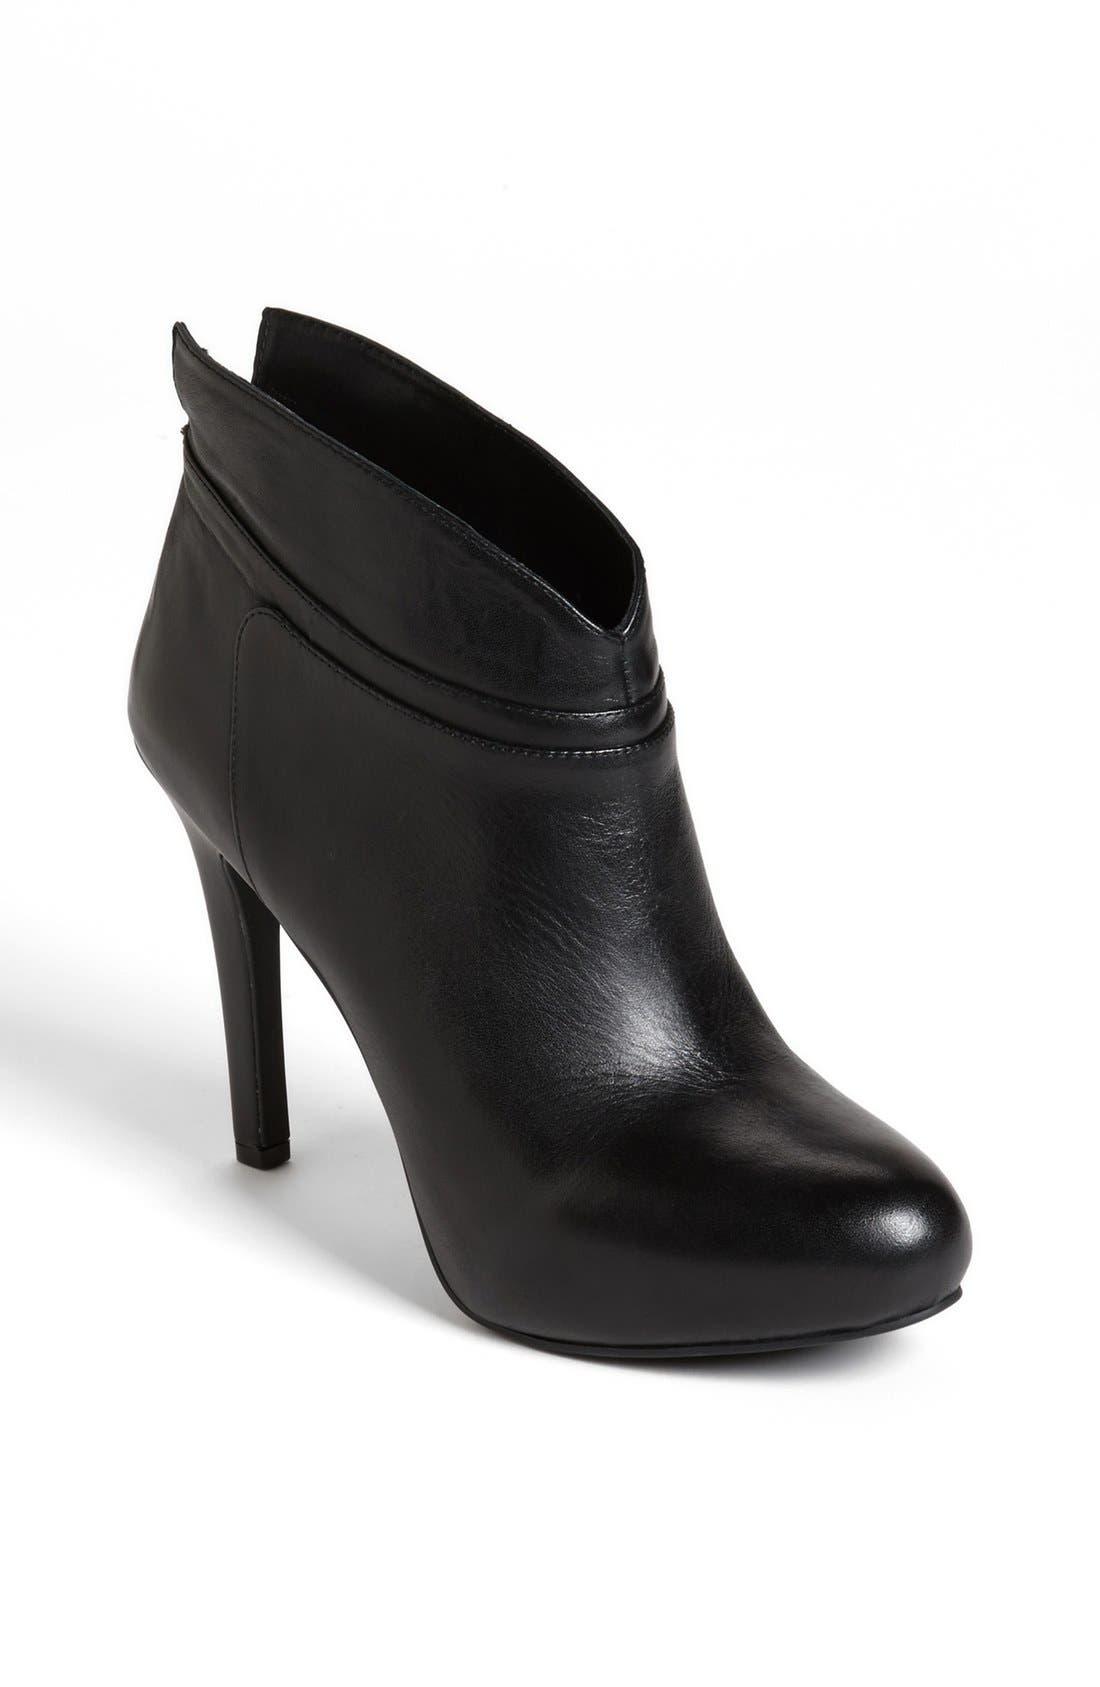 JESSICA SIMPSON 'Aggie' Boot, Main, color, 001